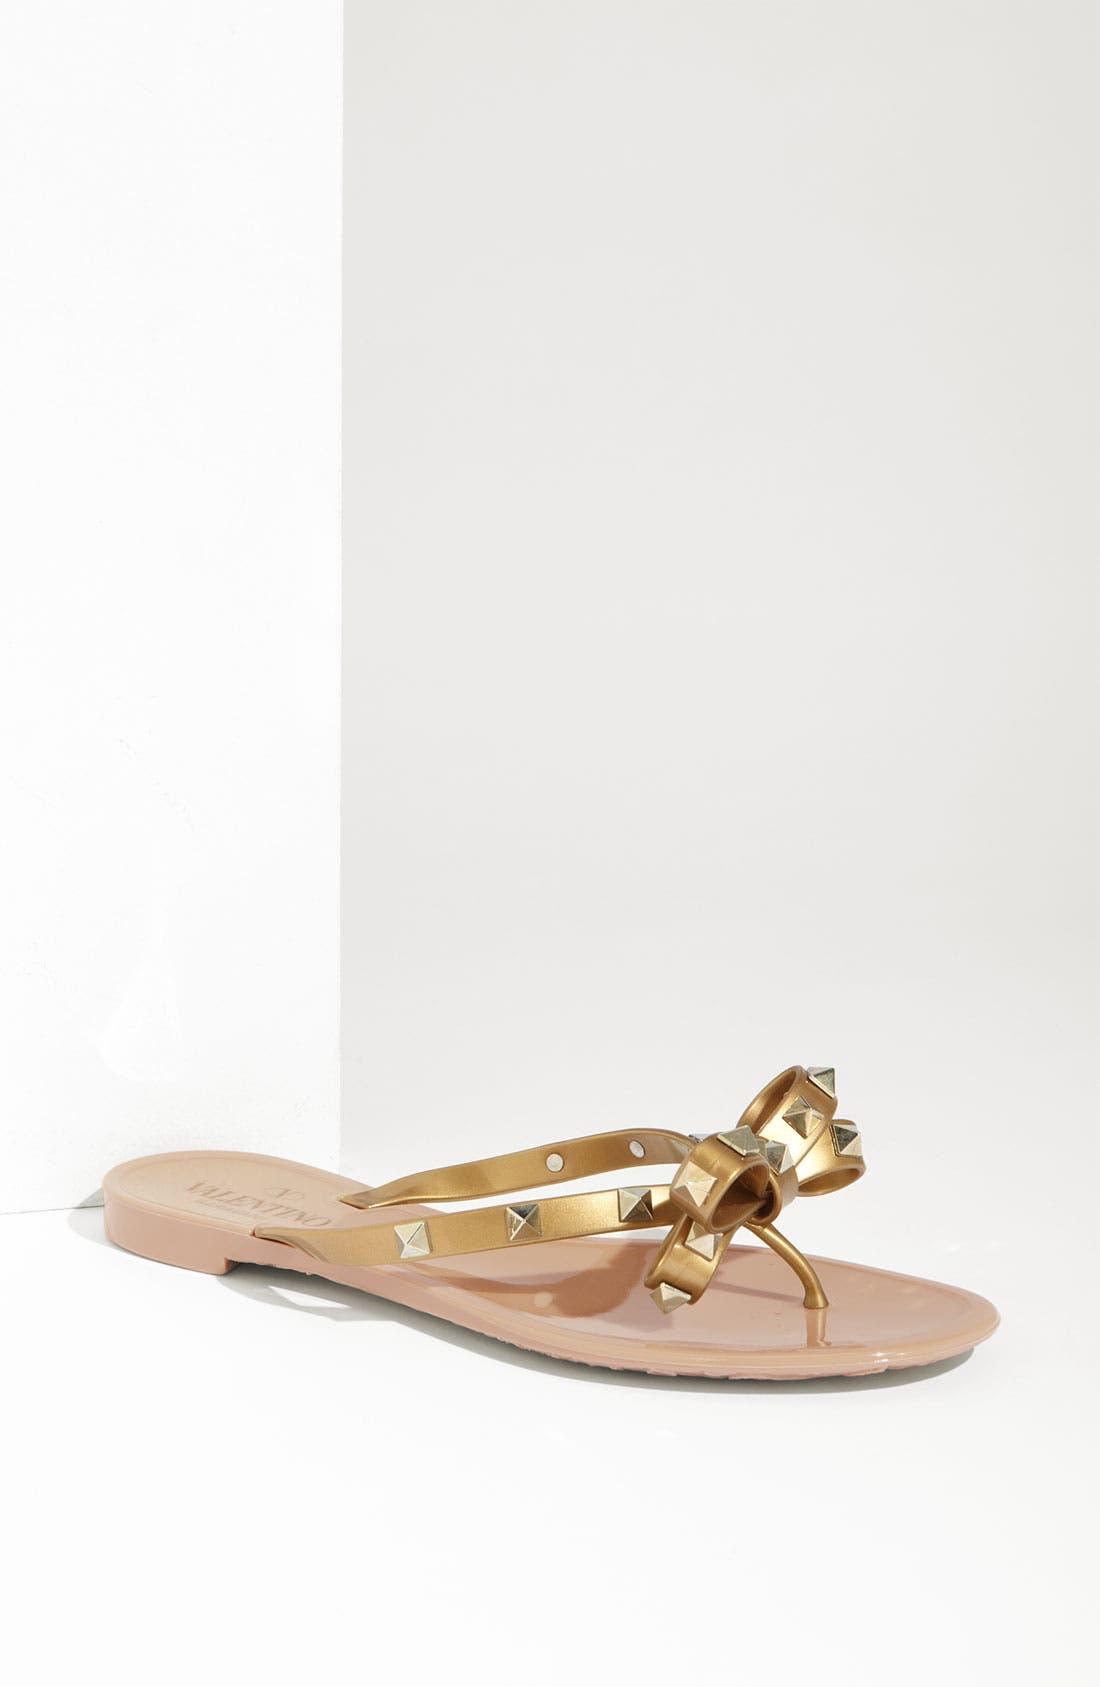 Alternate Image 1 Selected - VALENTINO GARAVANI 'Rockstud' Flip Flop (Women)